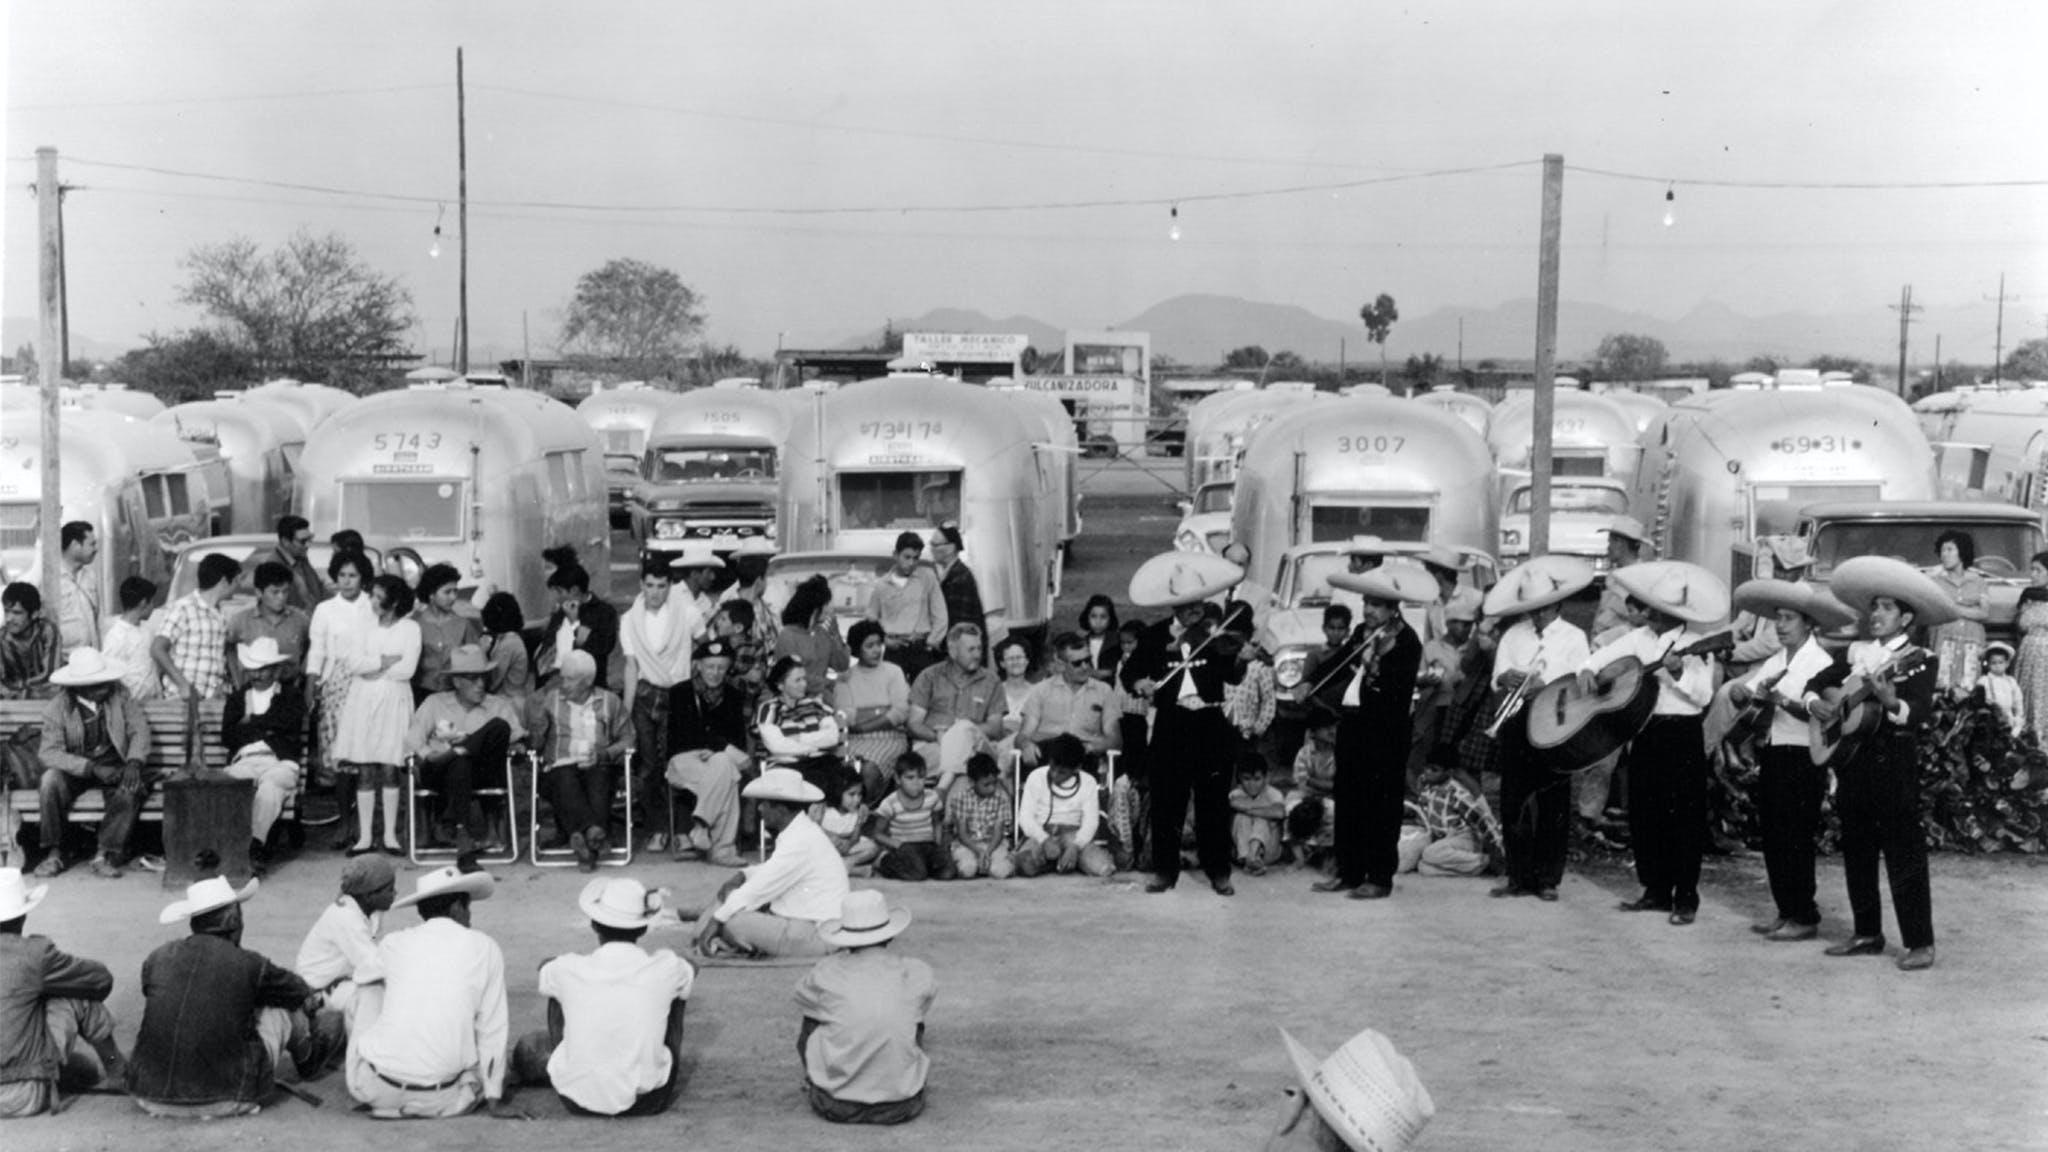 Caravanners-mariachi-band-1962-1963-Caravan-to-Mexico-hero